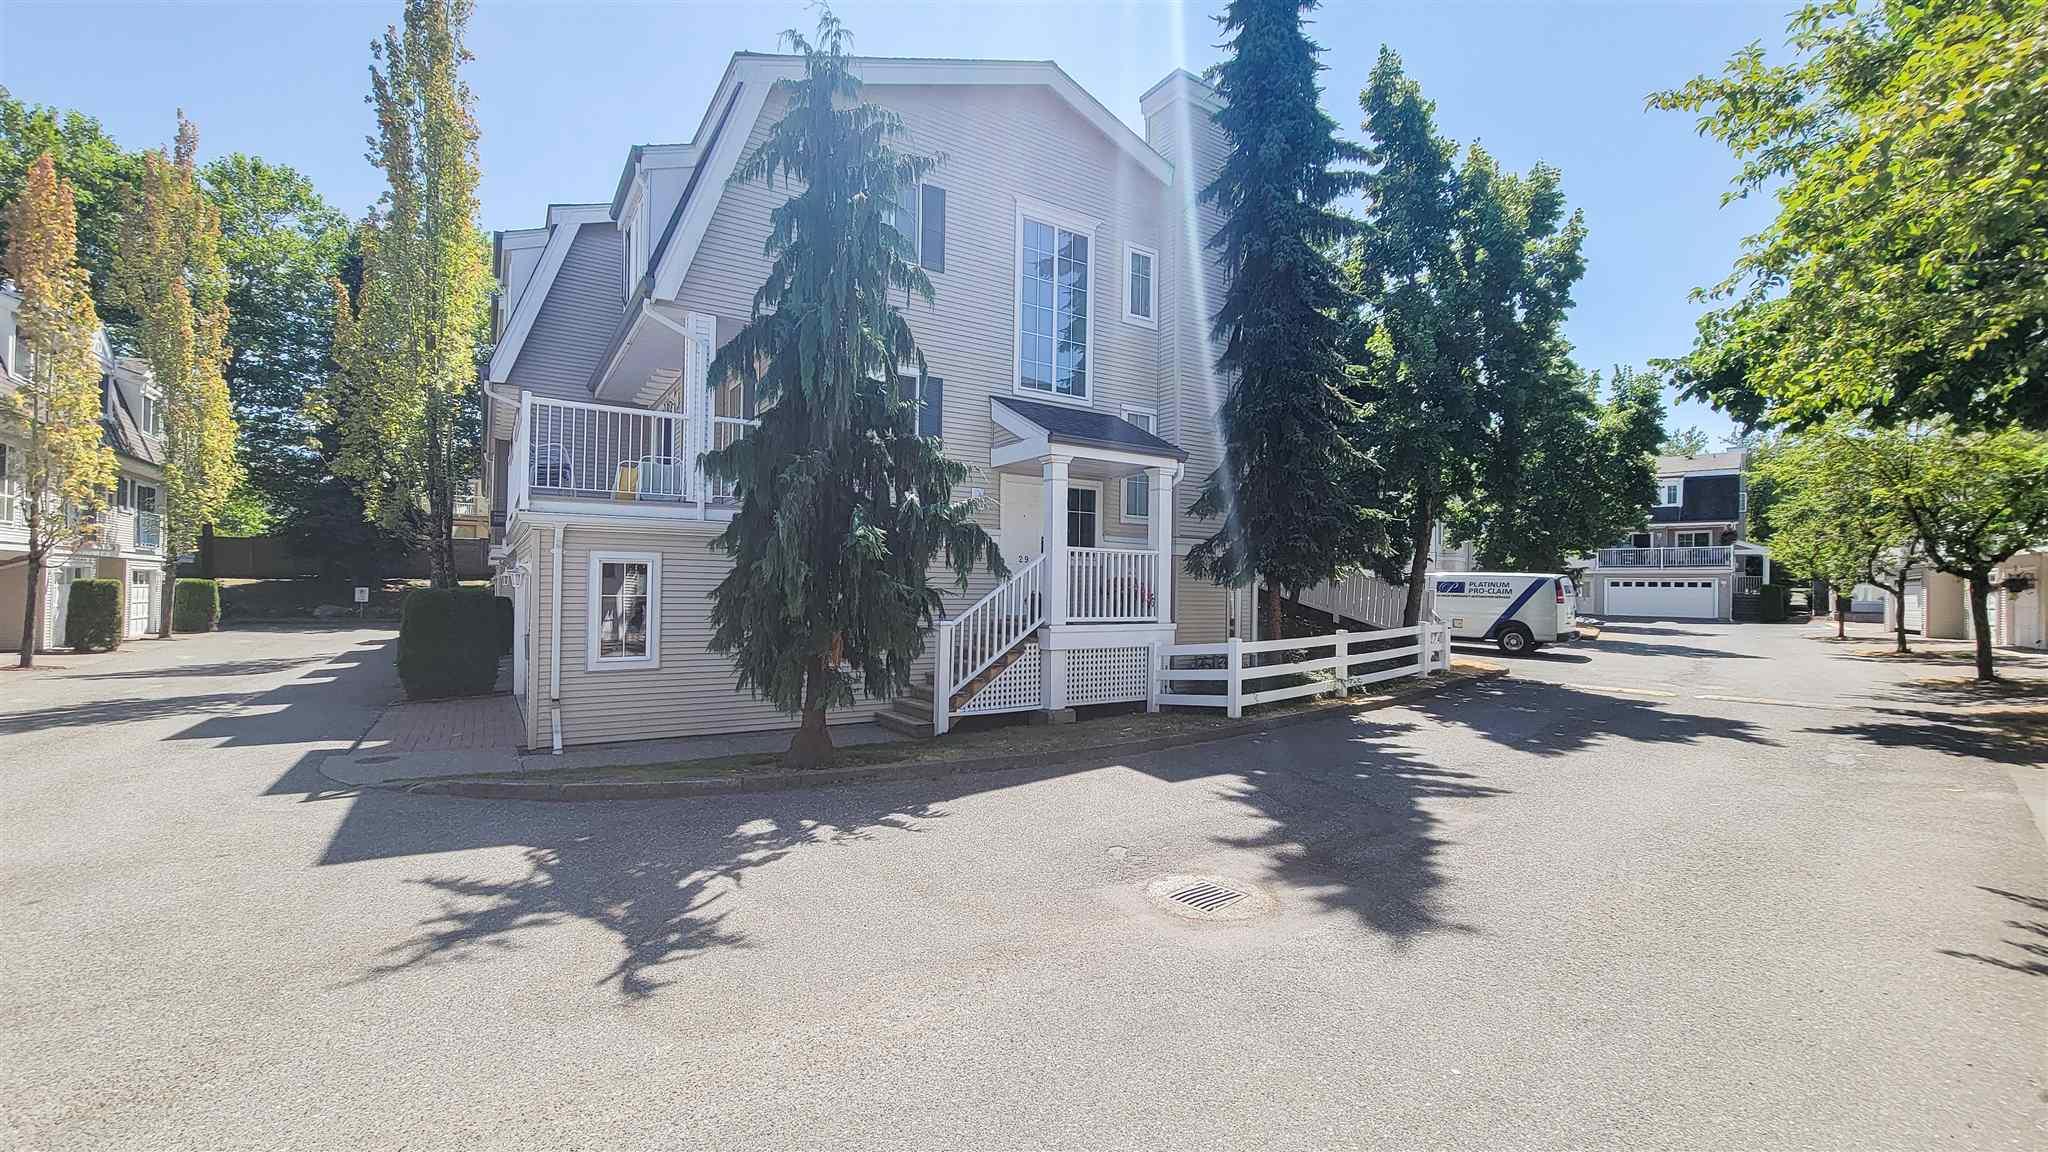 29 8930 WALNUT GROVE DRIVE - Walnut Grove Townhouse for sale, 4 Bedrooms (R2604734) - #1